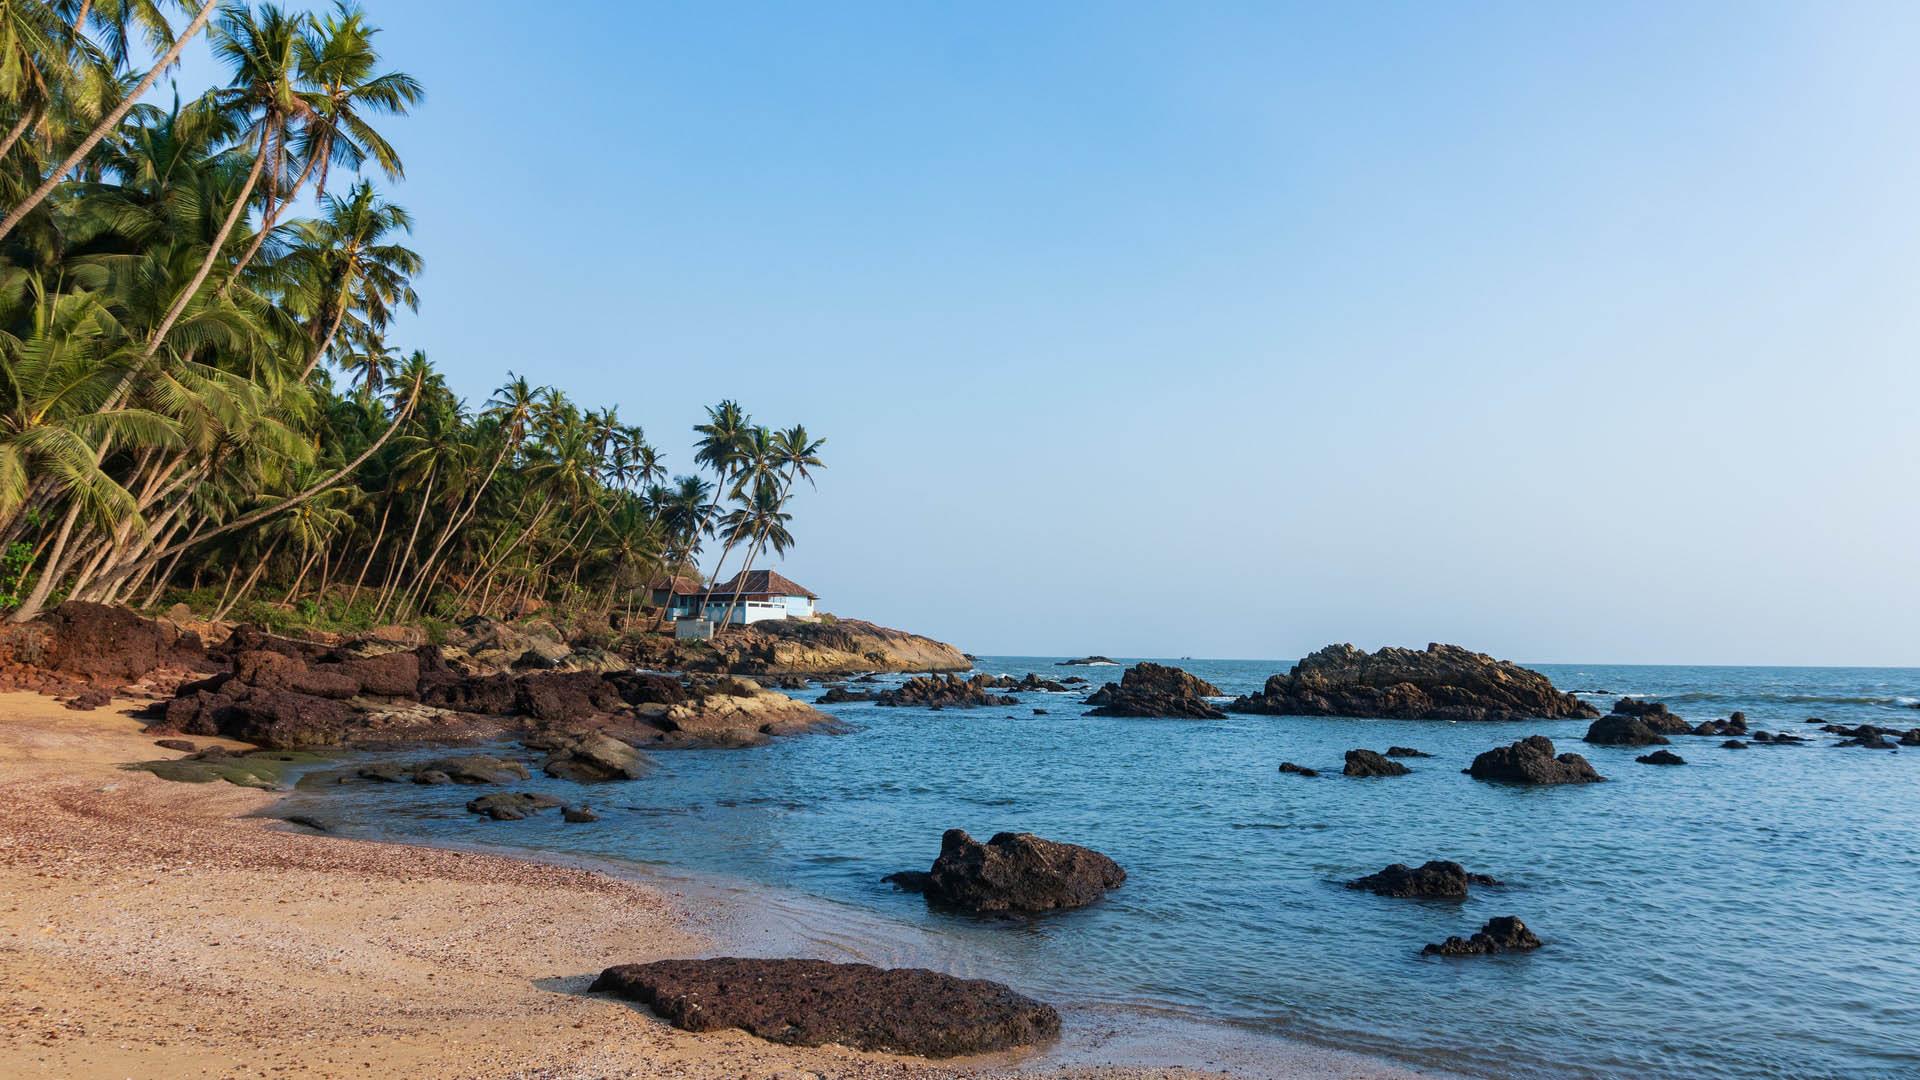 Kerala Beaches - India and Kerala Connections